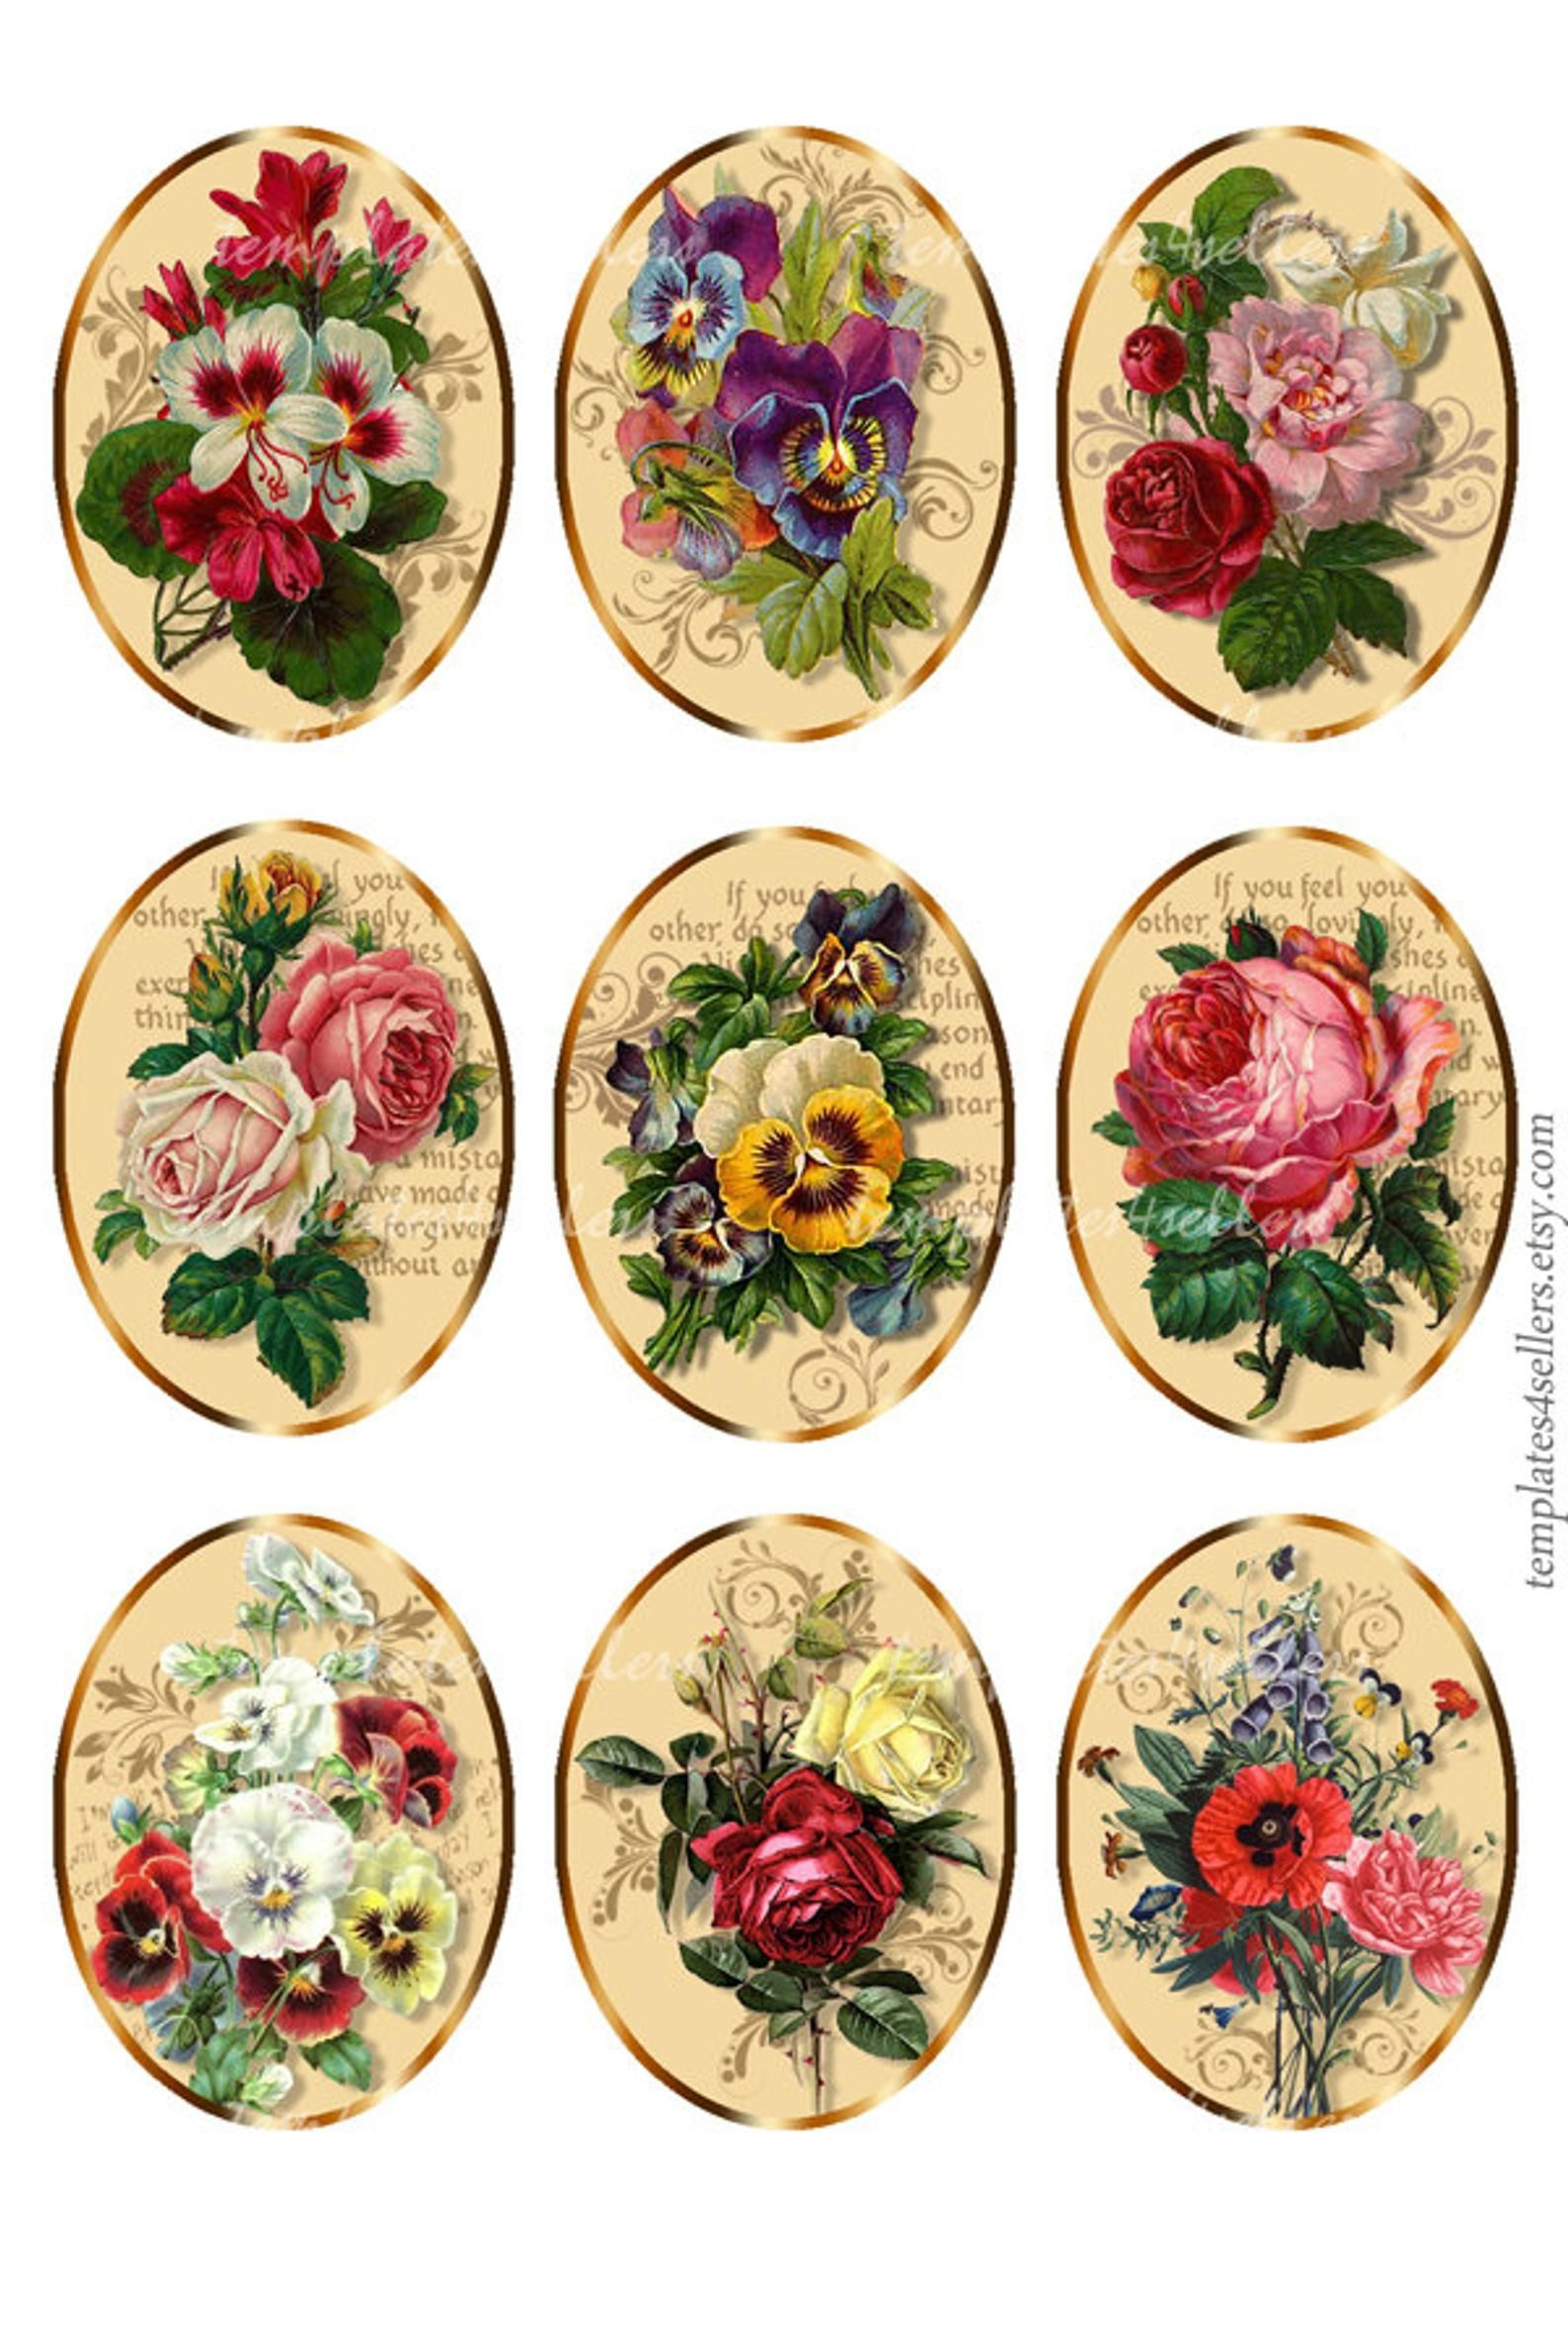 Vintage Backgrounds 30 x 40mm Ovals for Jewelry Pendants Digital Collage Sheet Download 880 Instant Download Printables